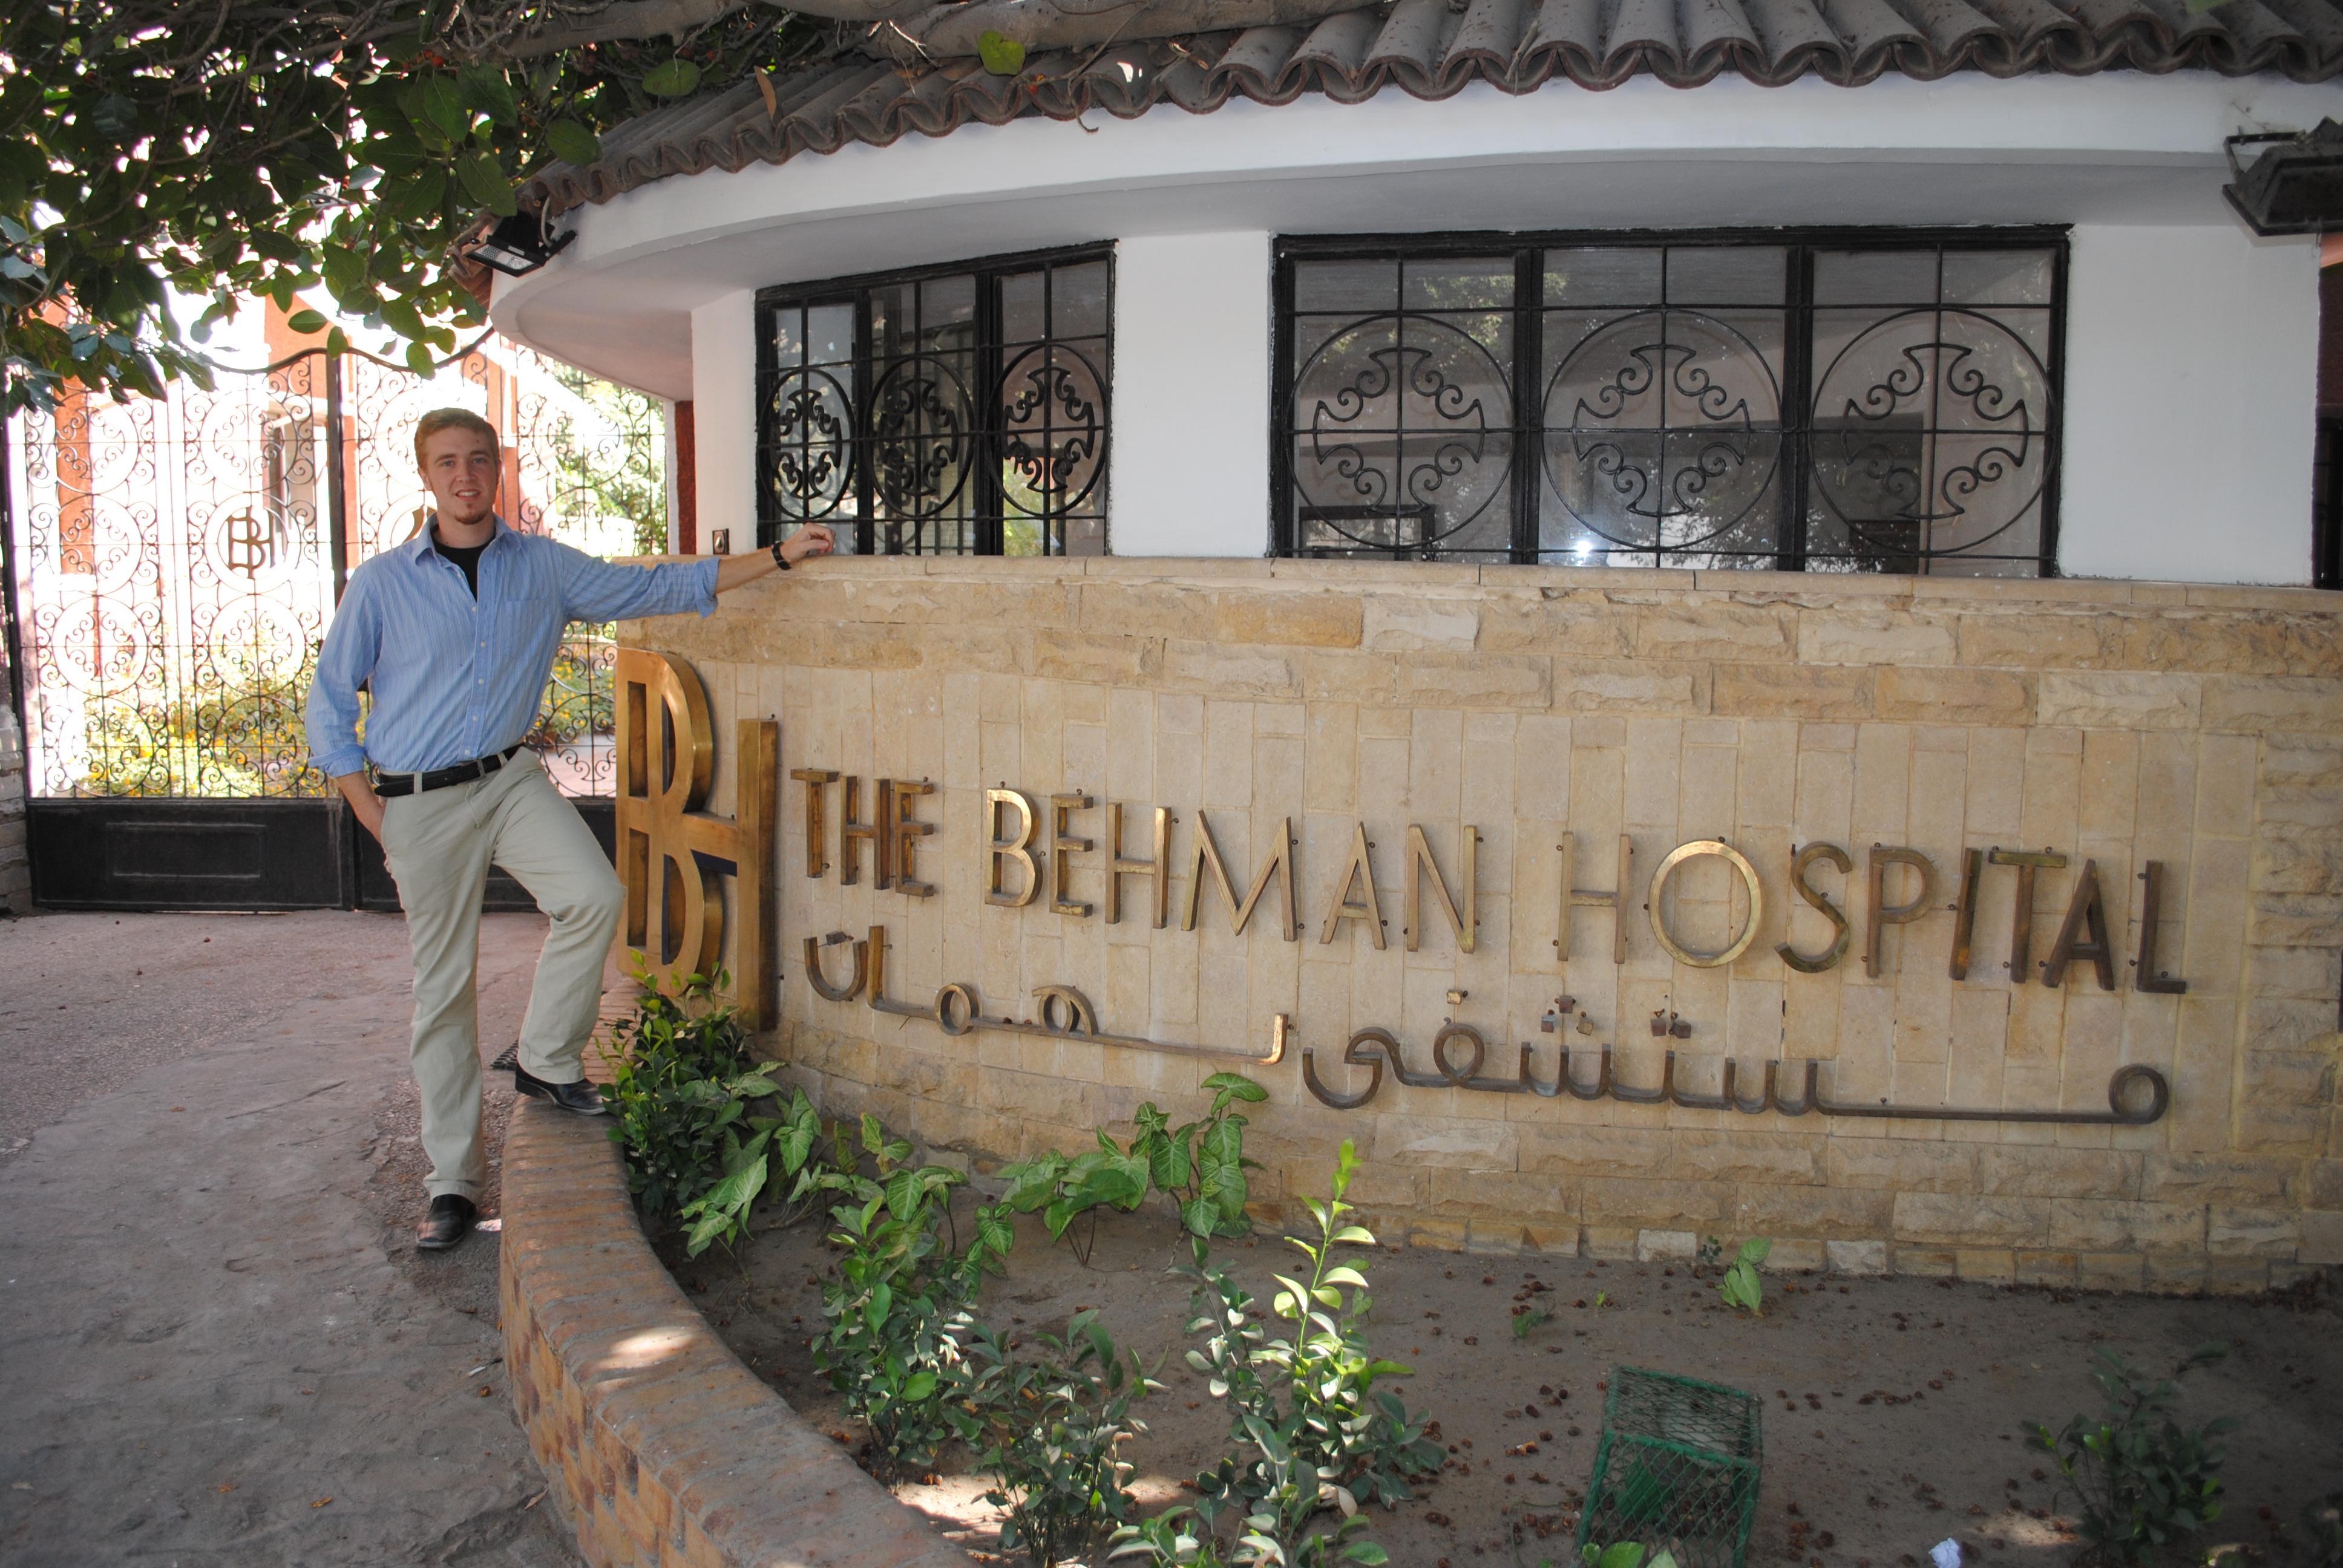 Behmen Hospital – Helwan